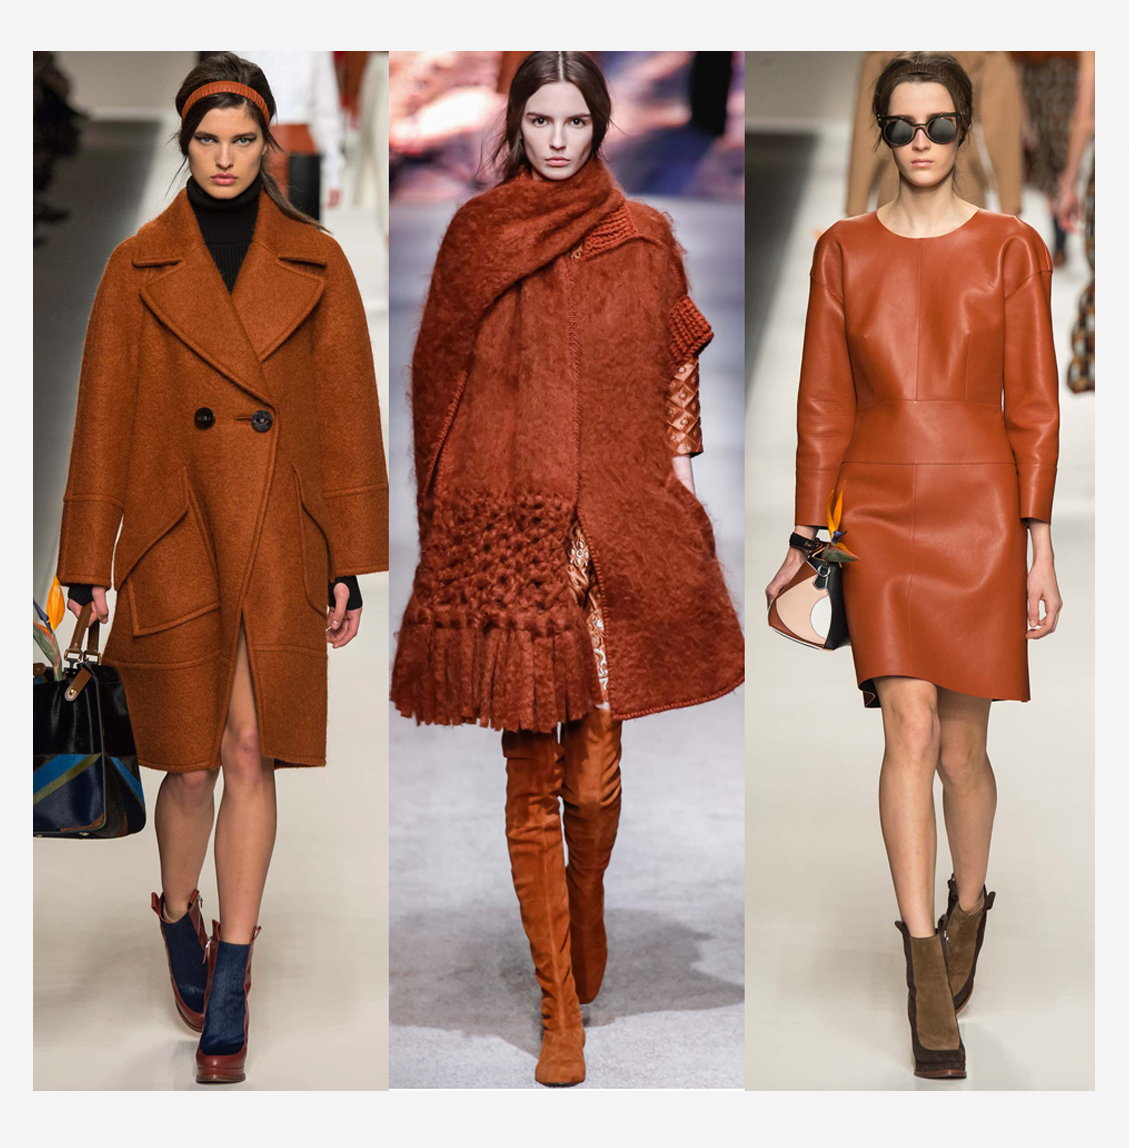 trend report fall winter 2015 2016 terracotta color palette zanita h stmode 2015 fashion. Black Bedroom Furniture Sets. Home Design Ideas